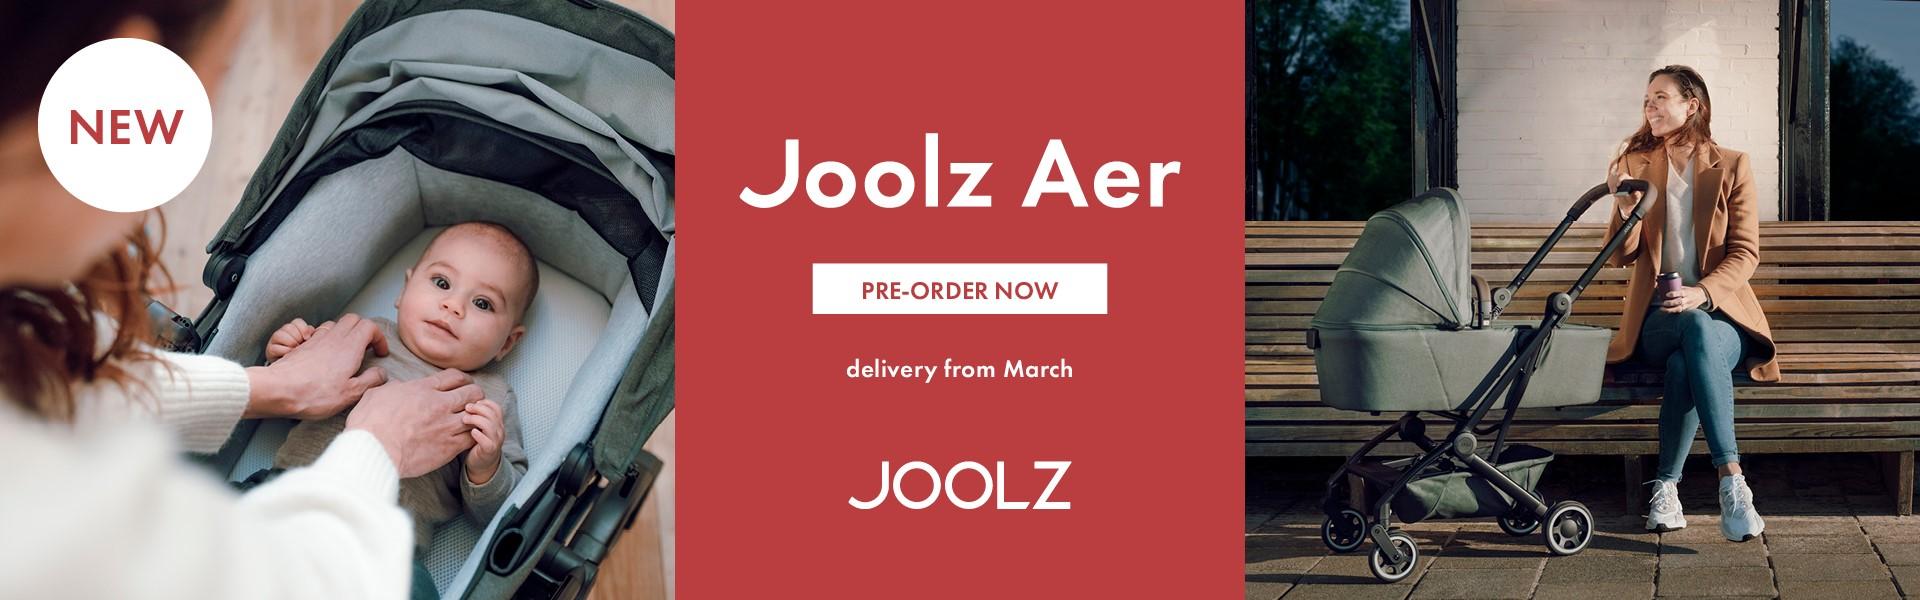 Joolz Aer Cot Pre Order